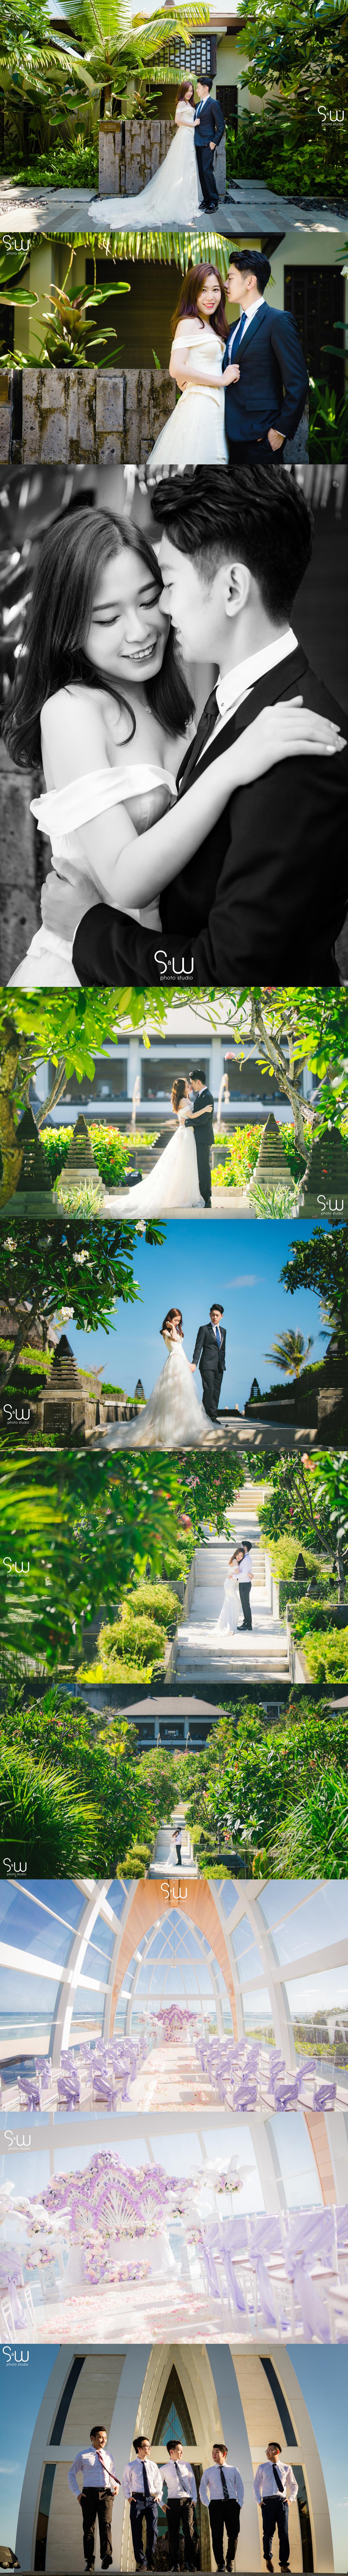 WEDDING | The Ritz-Carlton, Bali (峇里島婚禮) | sw photo studio 婚禮, 婚攝, 婚紗, 海外婚禮, 海外婚紗, 海島婚禮,峇里島婚禮, 峇里島婚紗, 台灣婚禮, 婚攝推薦